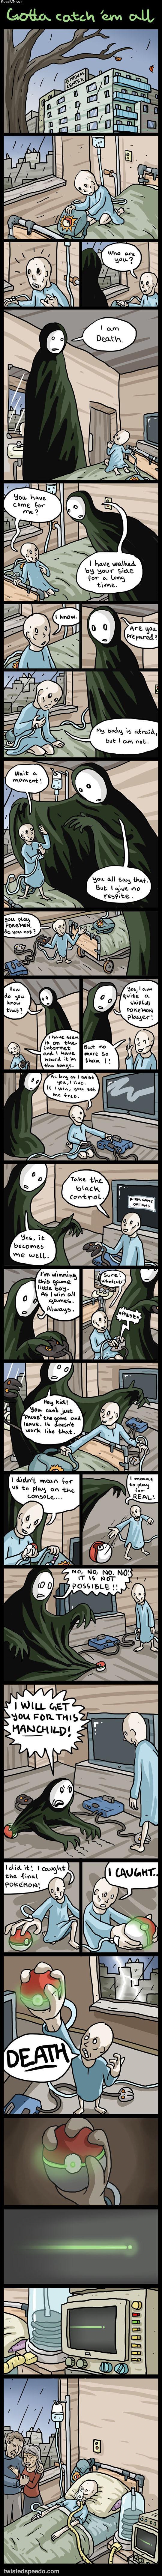 L'univers des Geeks - Page 2 Pokemon_comic